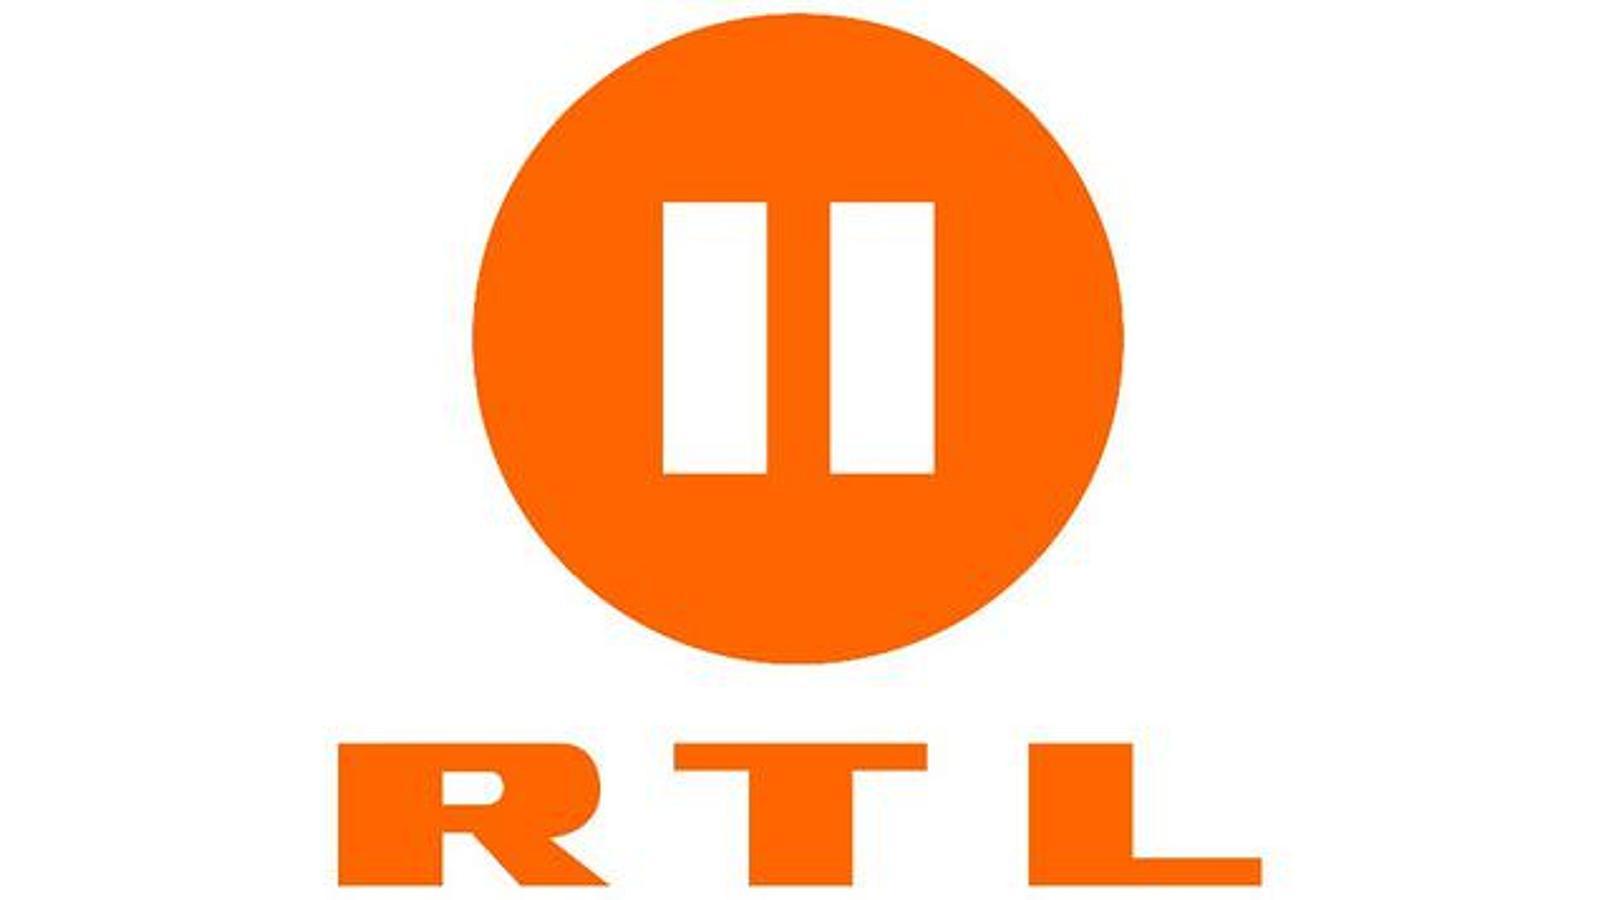 Rtl 2 Programm